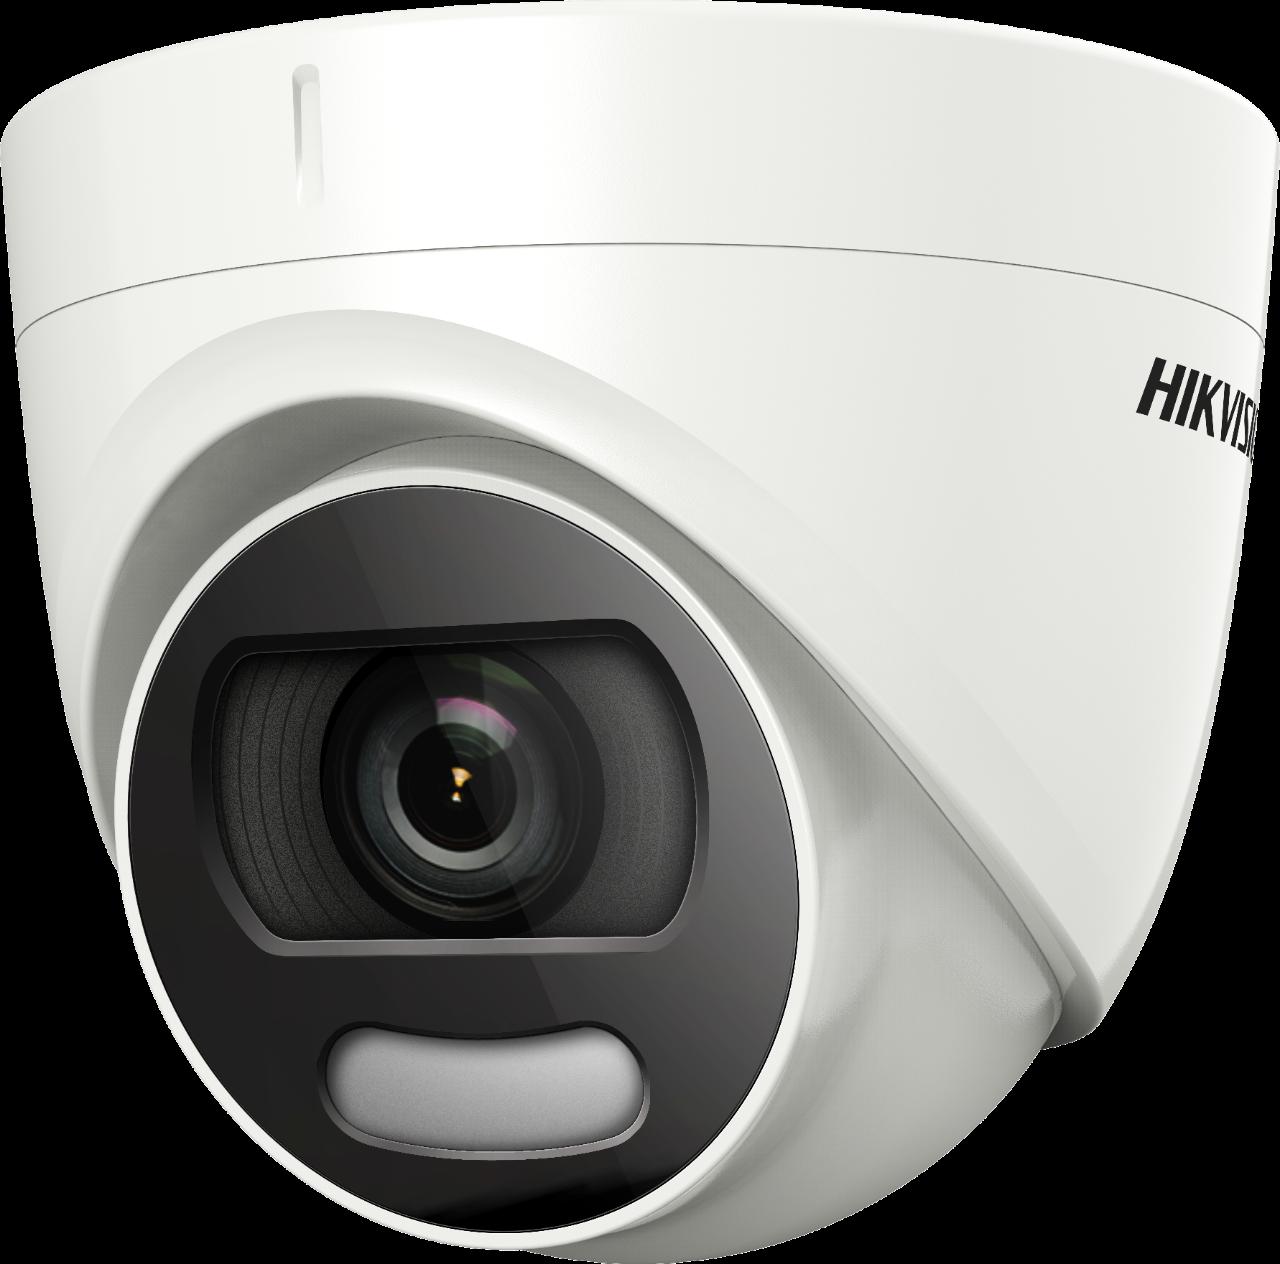 Turbo HD HDoC Eyeball / Turret camera Voor buitengebruik Resolutie: 5MP Lens: 2.8mm Wit licht 20m IP67 Voeding: 12VDC ColorVu - 24/7 color, 4in1, Up the Coax (HIkVision-C) 130dB True WDR